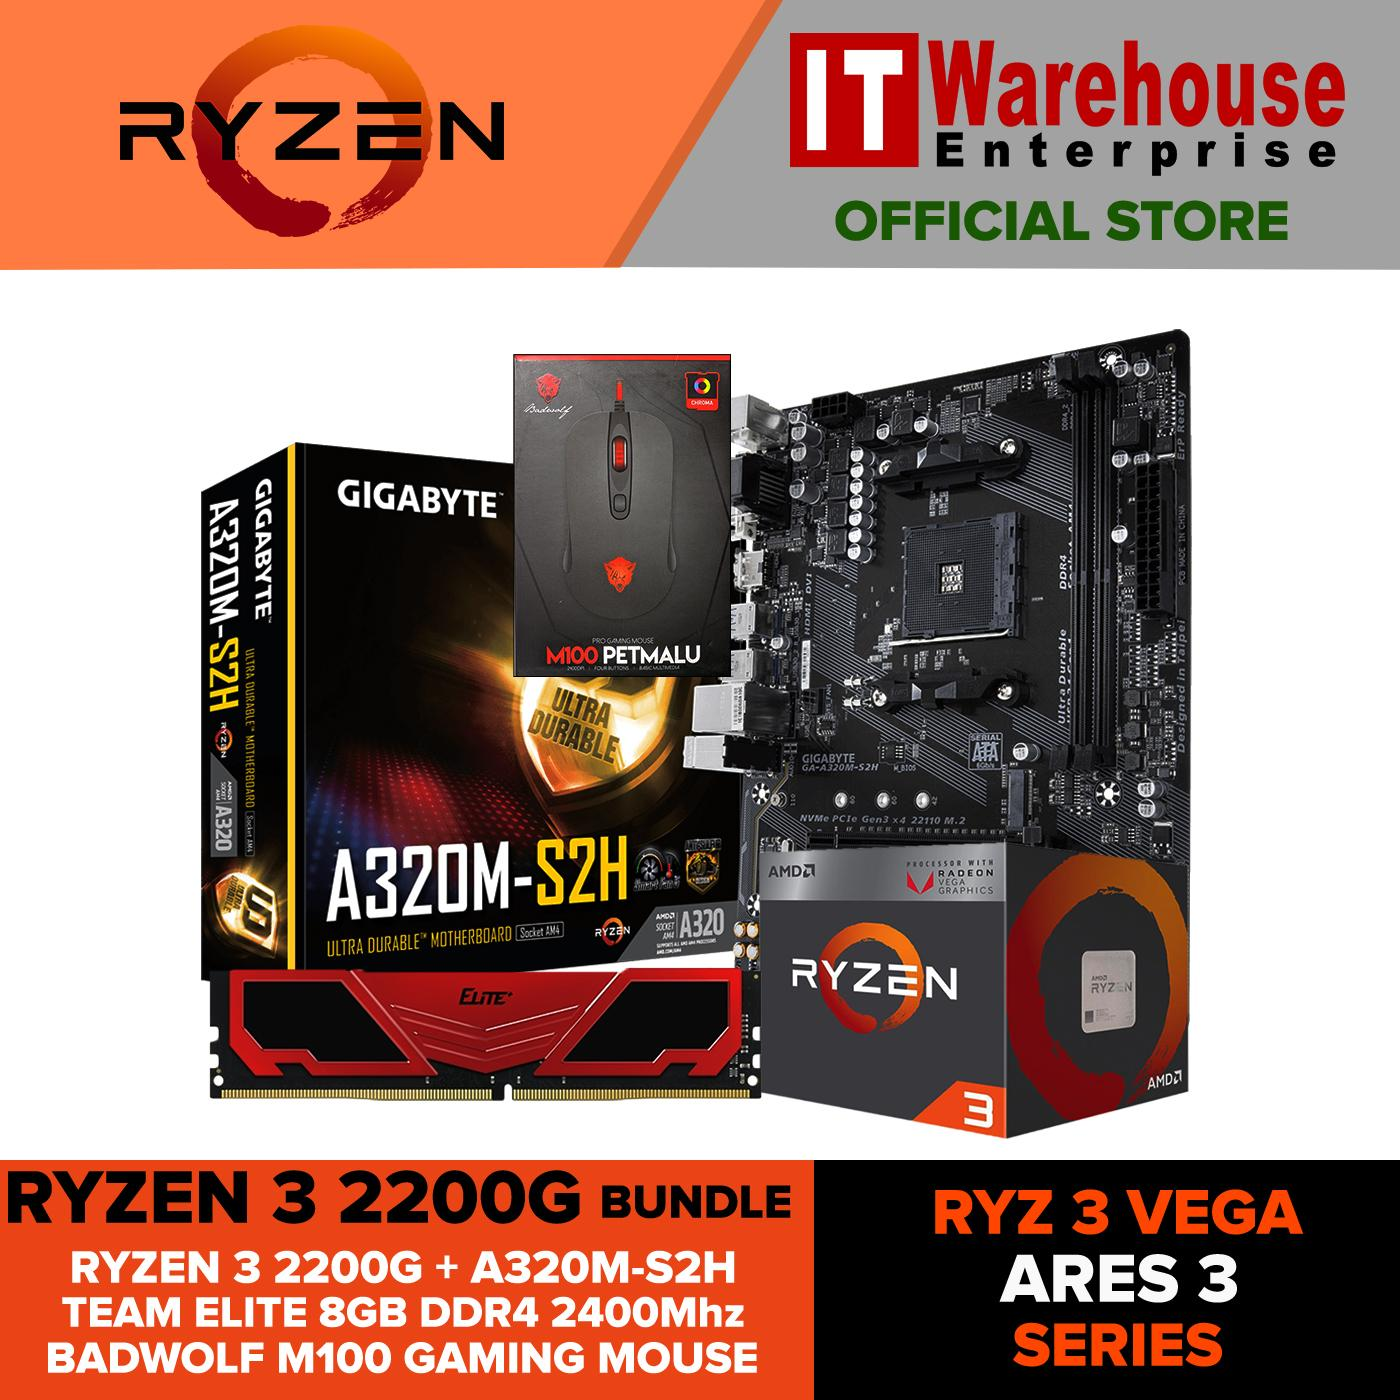 AMD Ryzen 3 2200G RYZ 3 VEGA ARES 3 Bundle Package Quad-Core 3 5 GHz Socket  AM4 65W with Radeon Vega 8 Graphics iGPU Desktop Processor with GIGABYTE